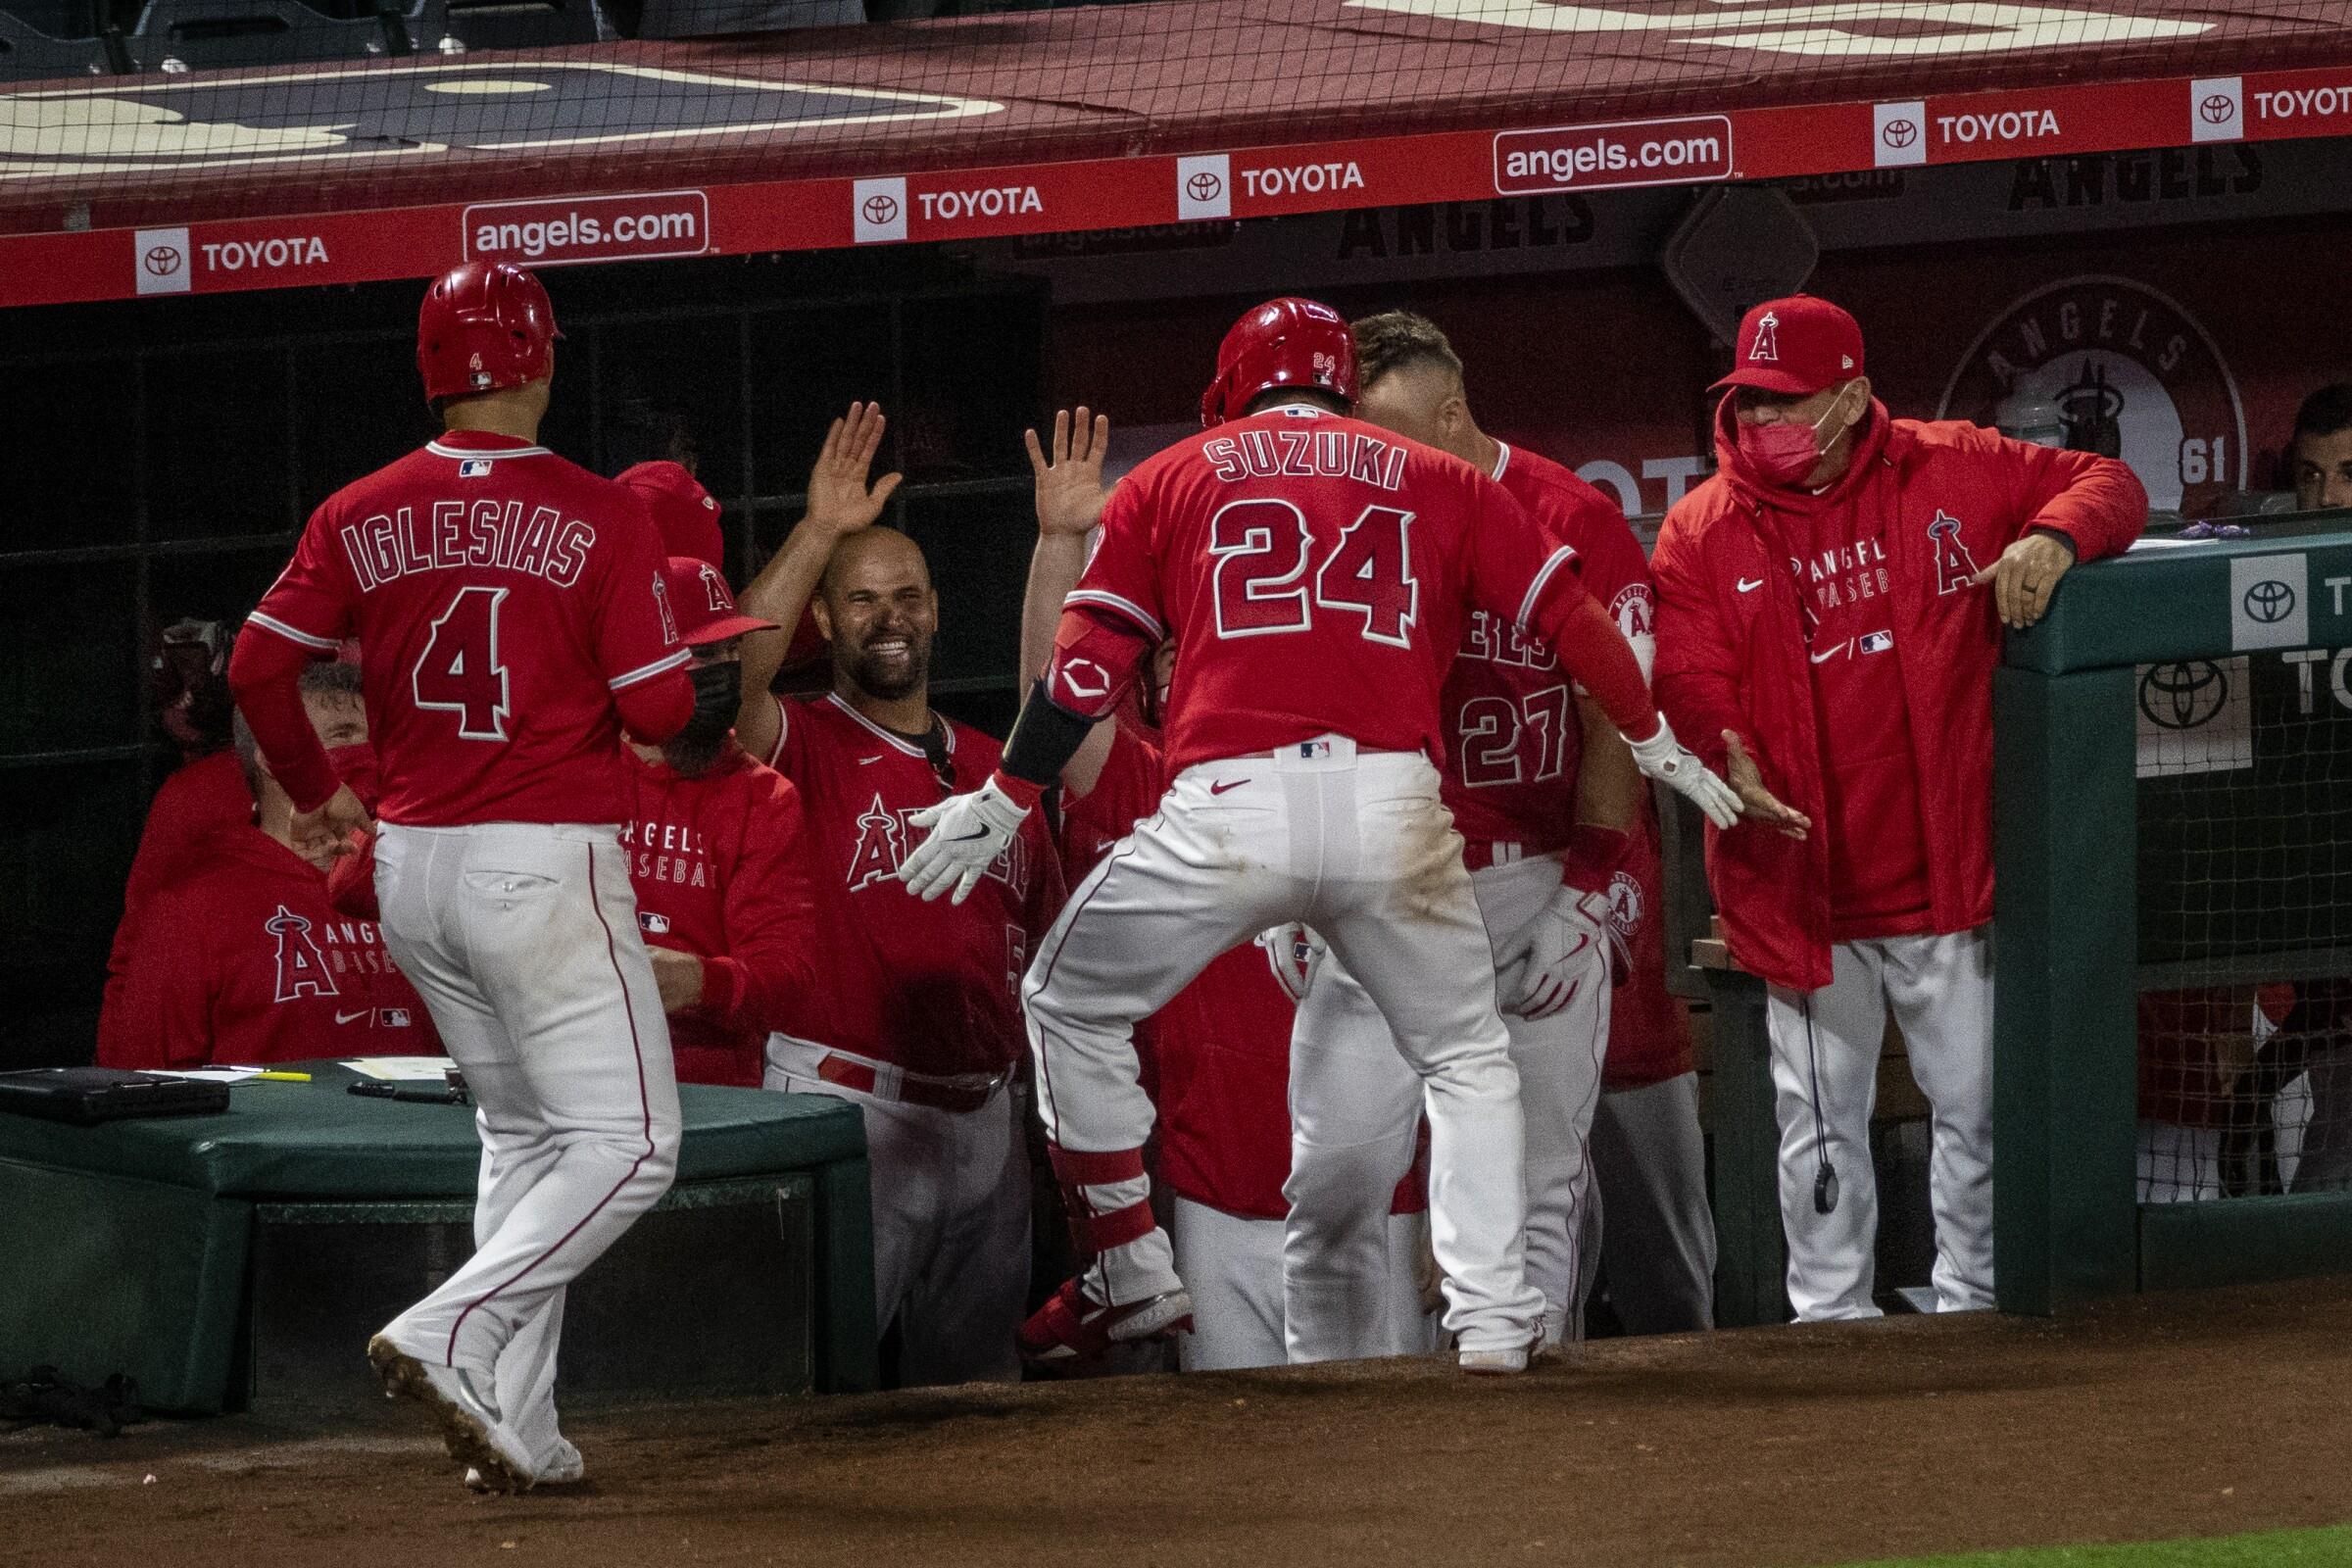 Angels catcher Kurt Suzuki is congratulated at the dugout after hitting a home run against the Texas Rangers.